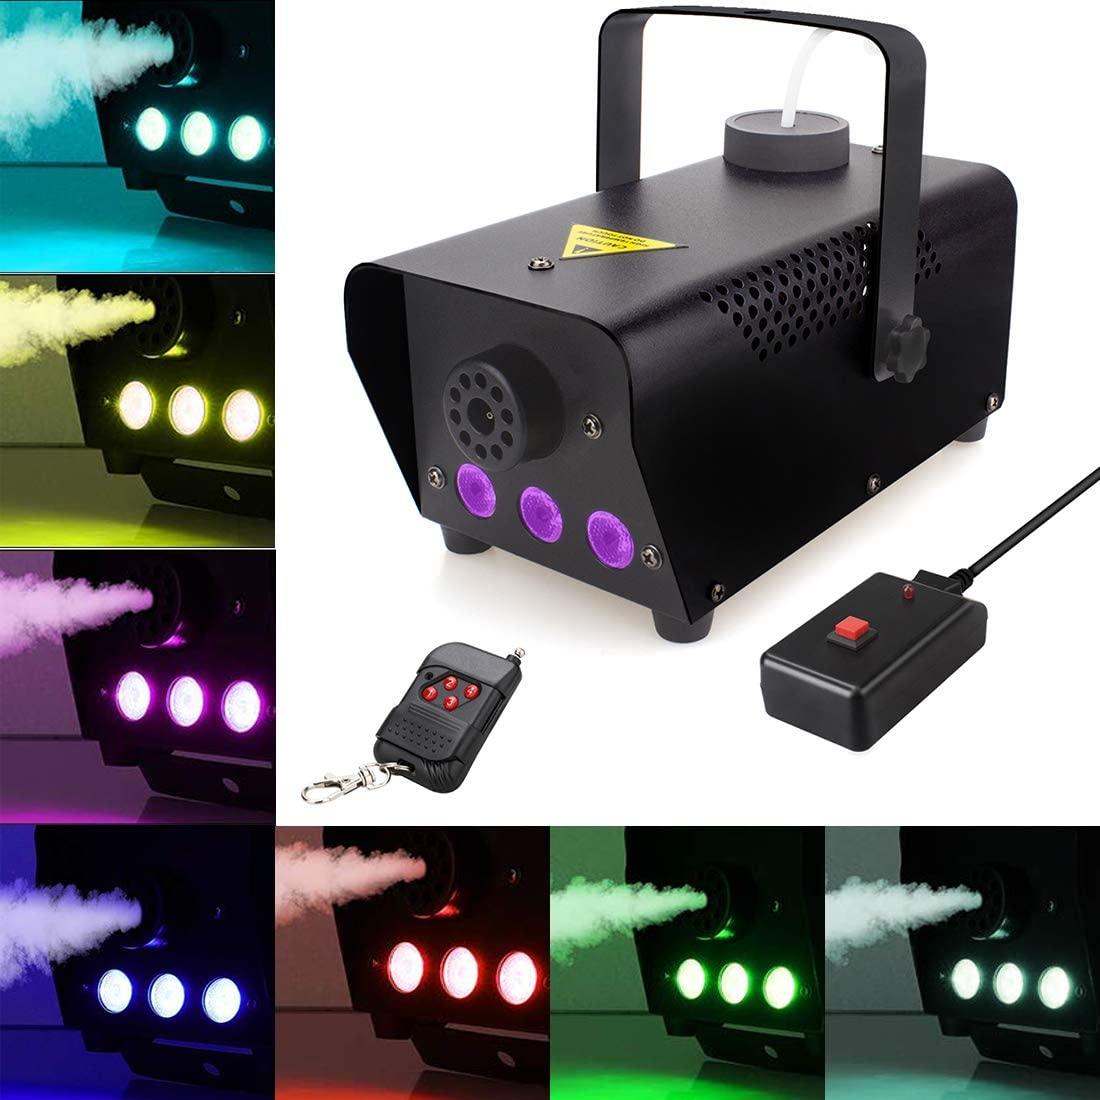 Fog Machine with lights, 7 Color LED 400-Watt Portable Fog Machine with Wireless Remote Control, Smoke Machines for Parties Halloween Wedding Christmas Dance DJ